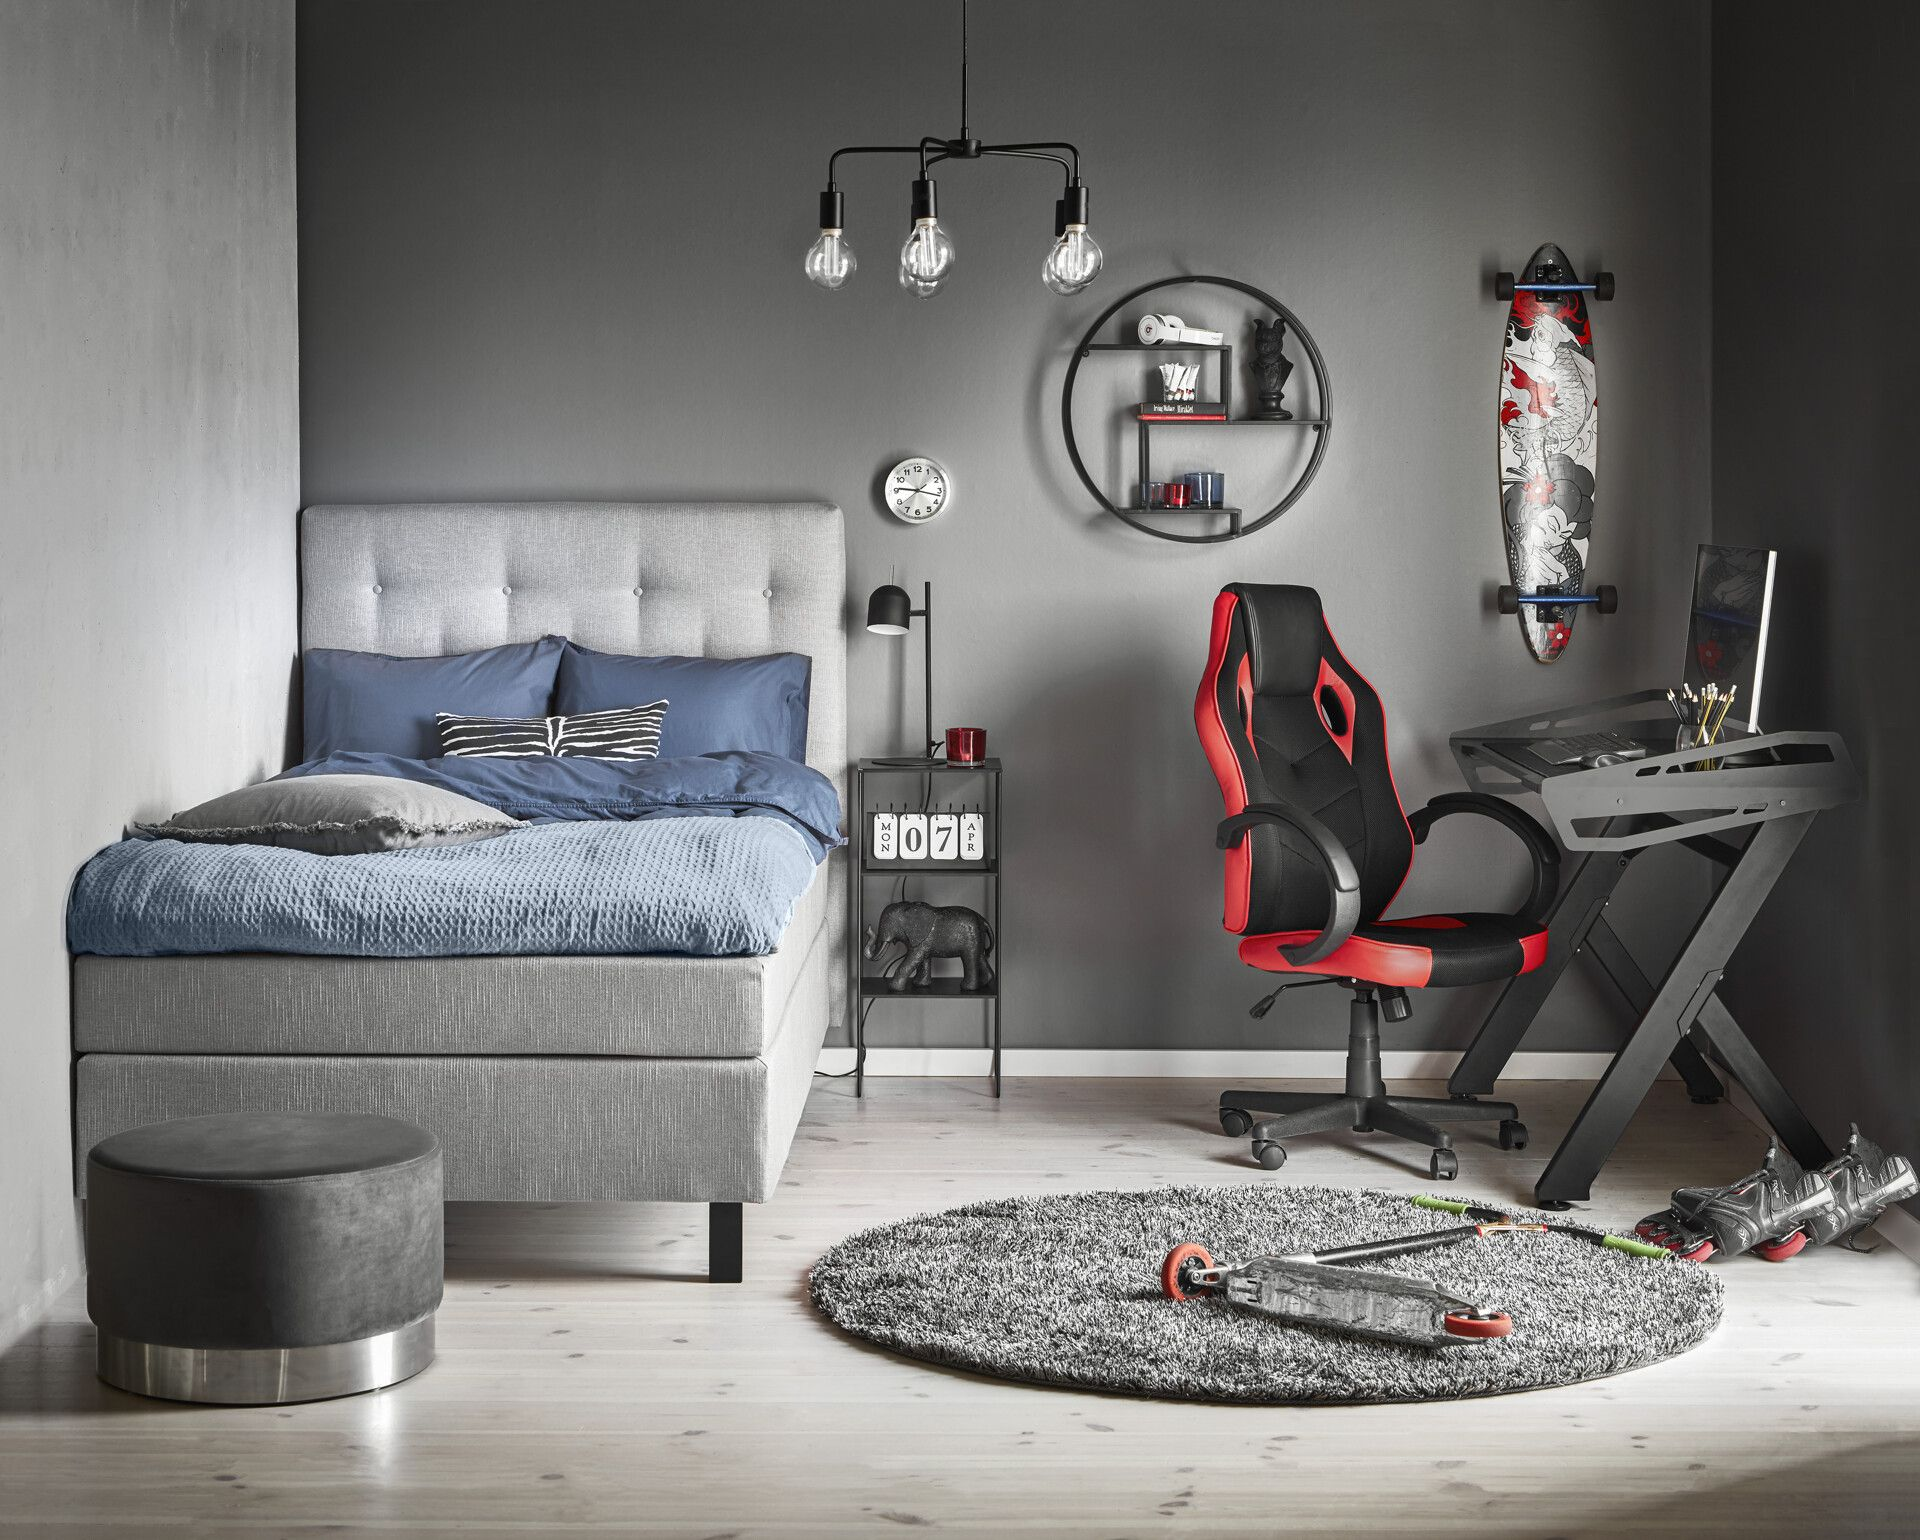 Alex Sängbord | Mio i 2020 | Sängbord, Sovrum, Pisa